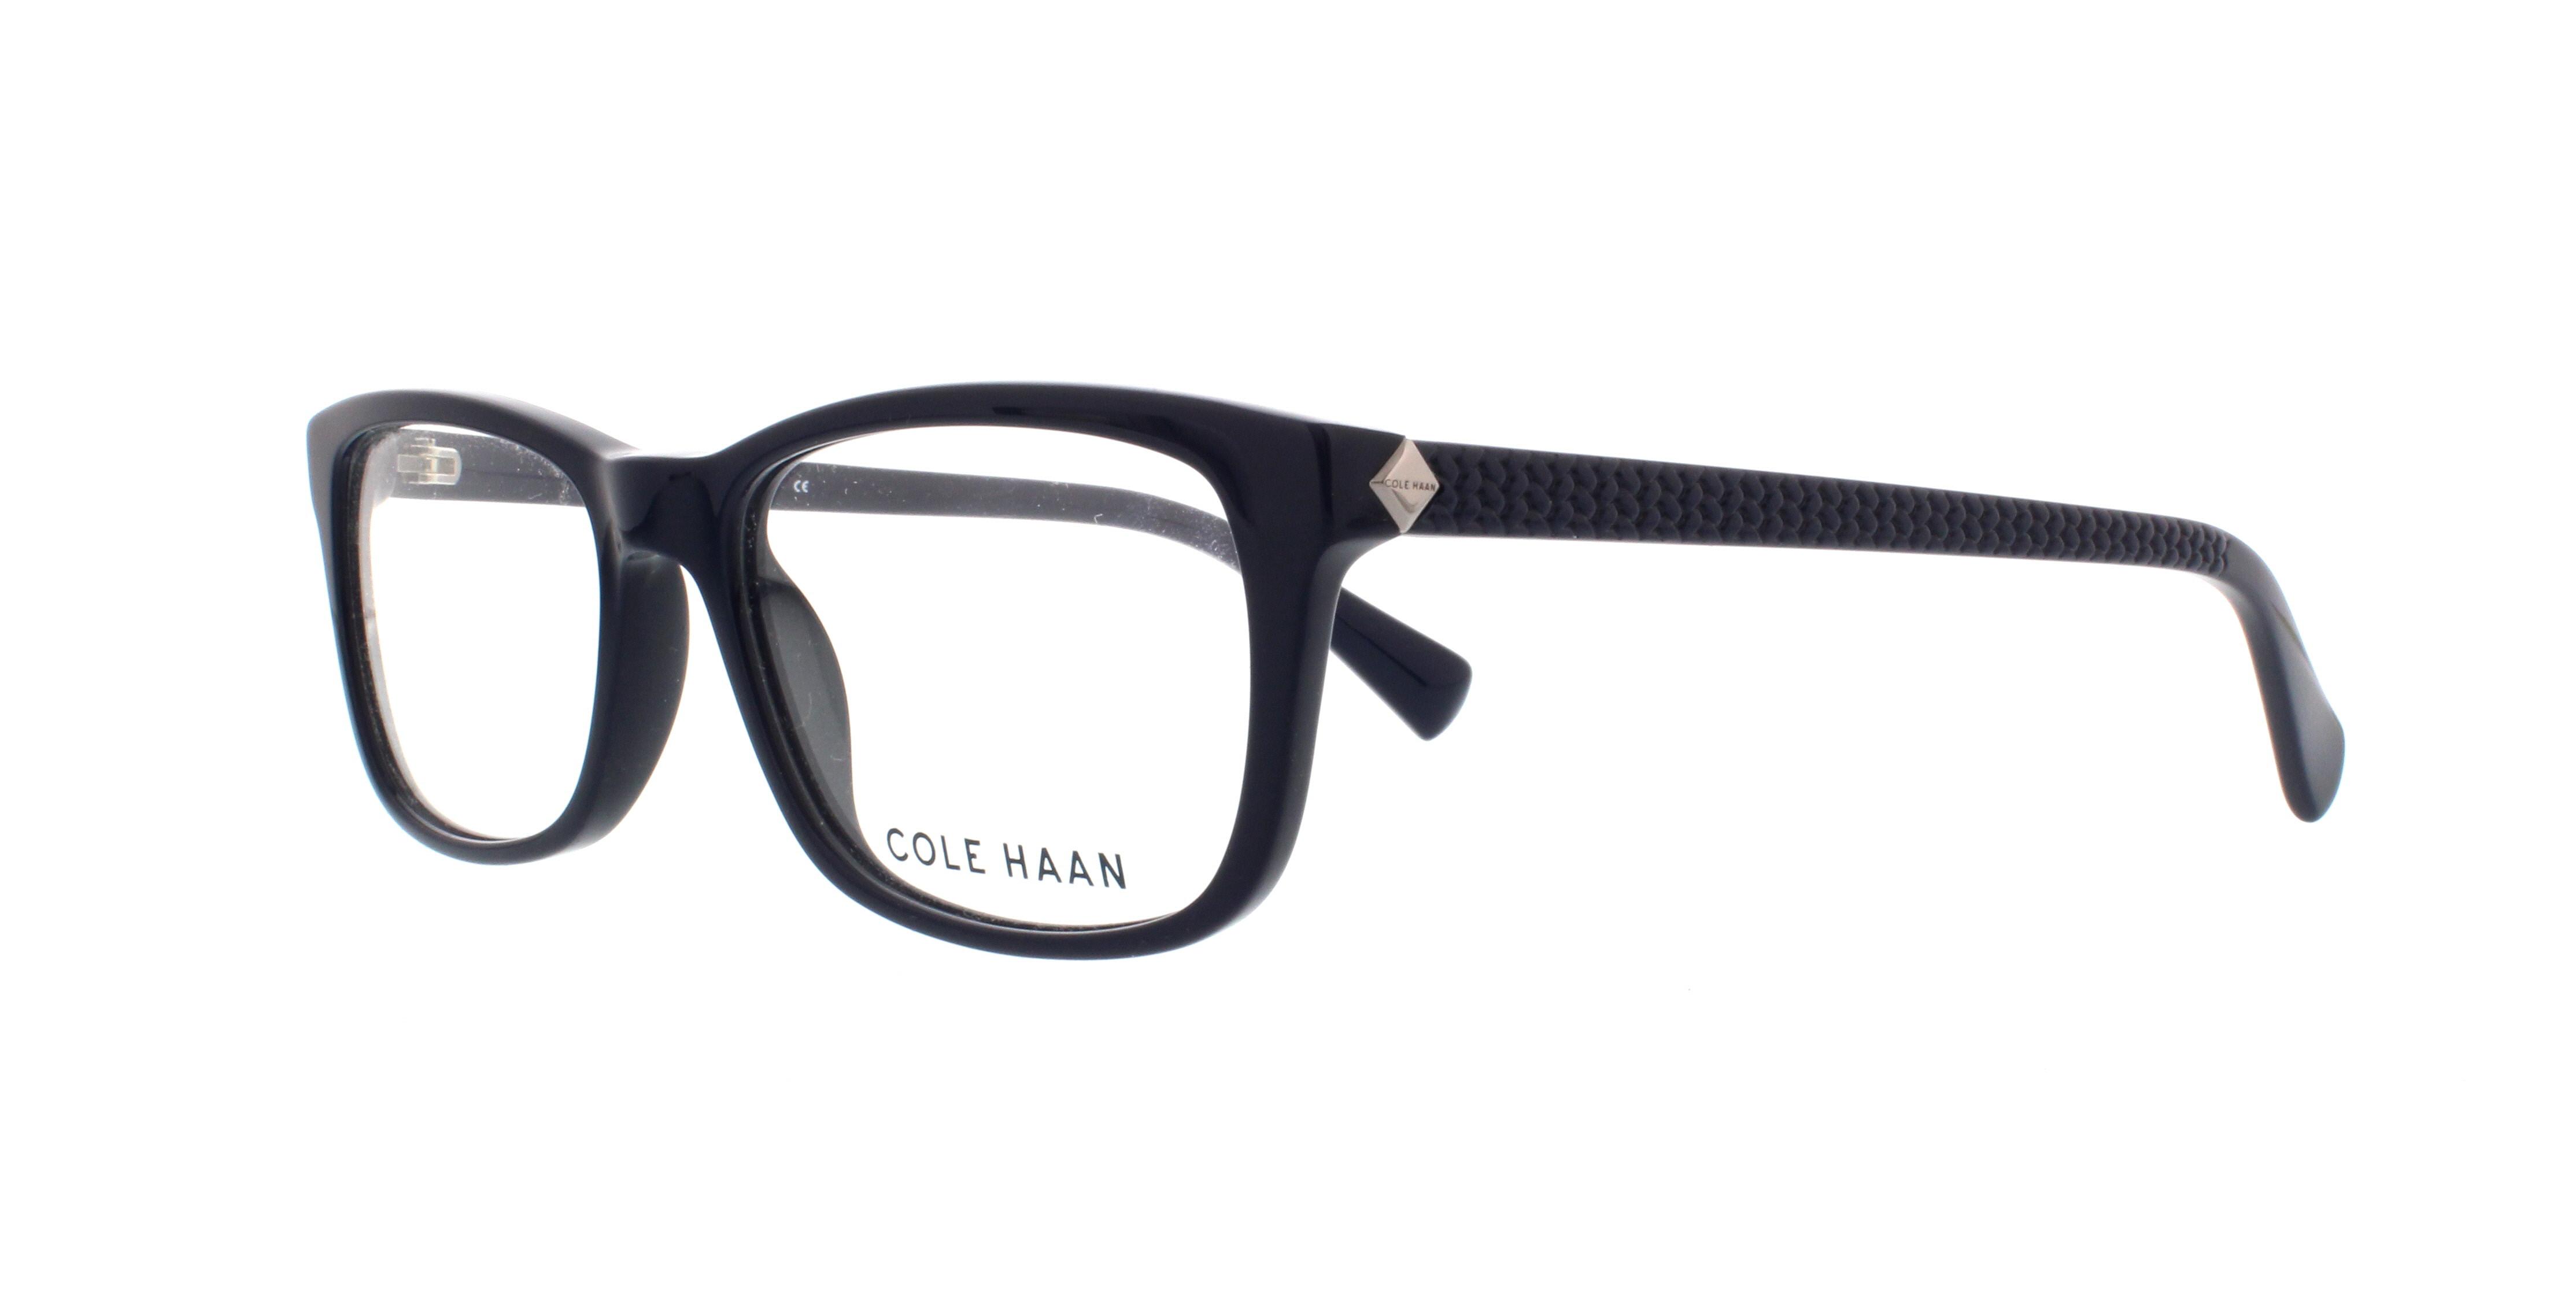 COLE HAAN Eyeglasses CH4000 414 Navy 53MM 788678534484 | eBay